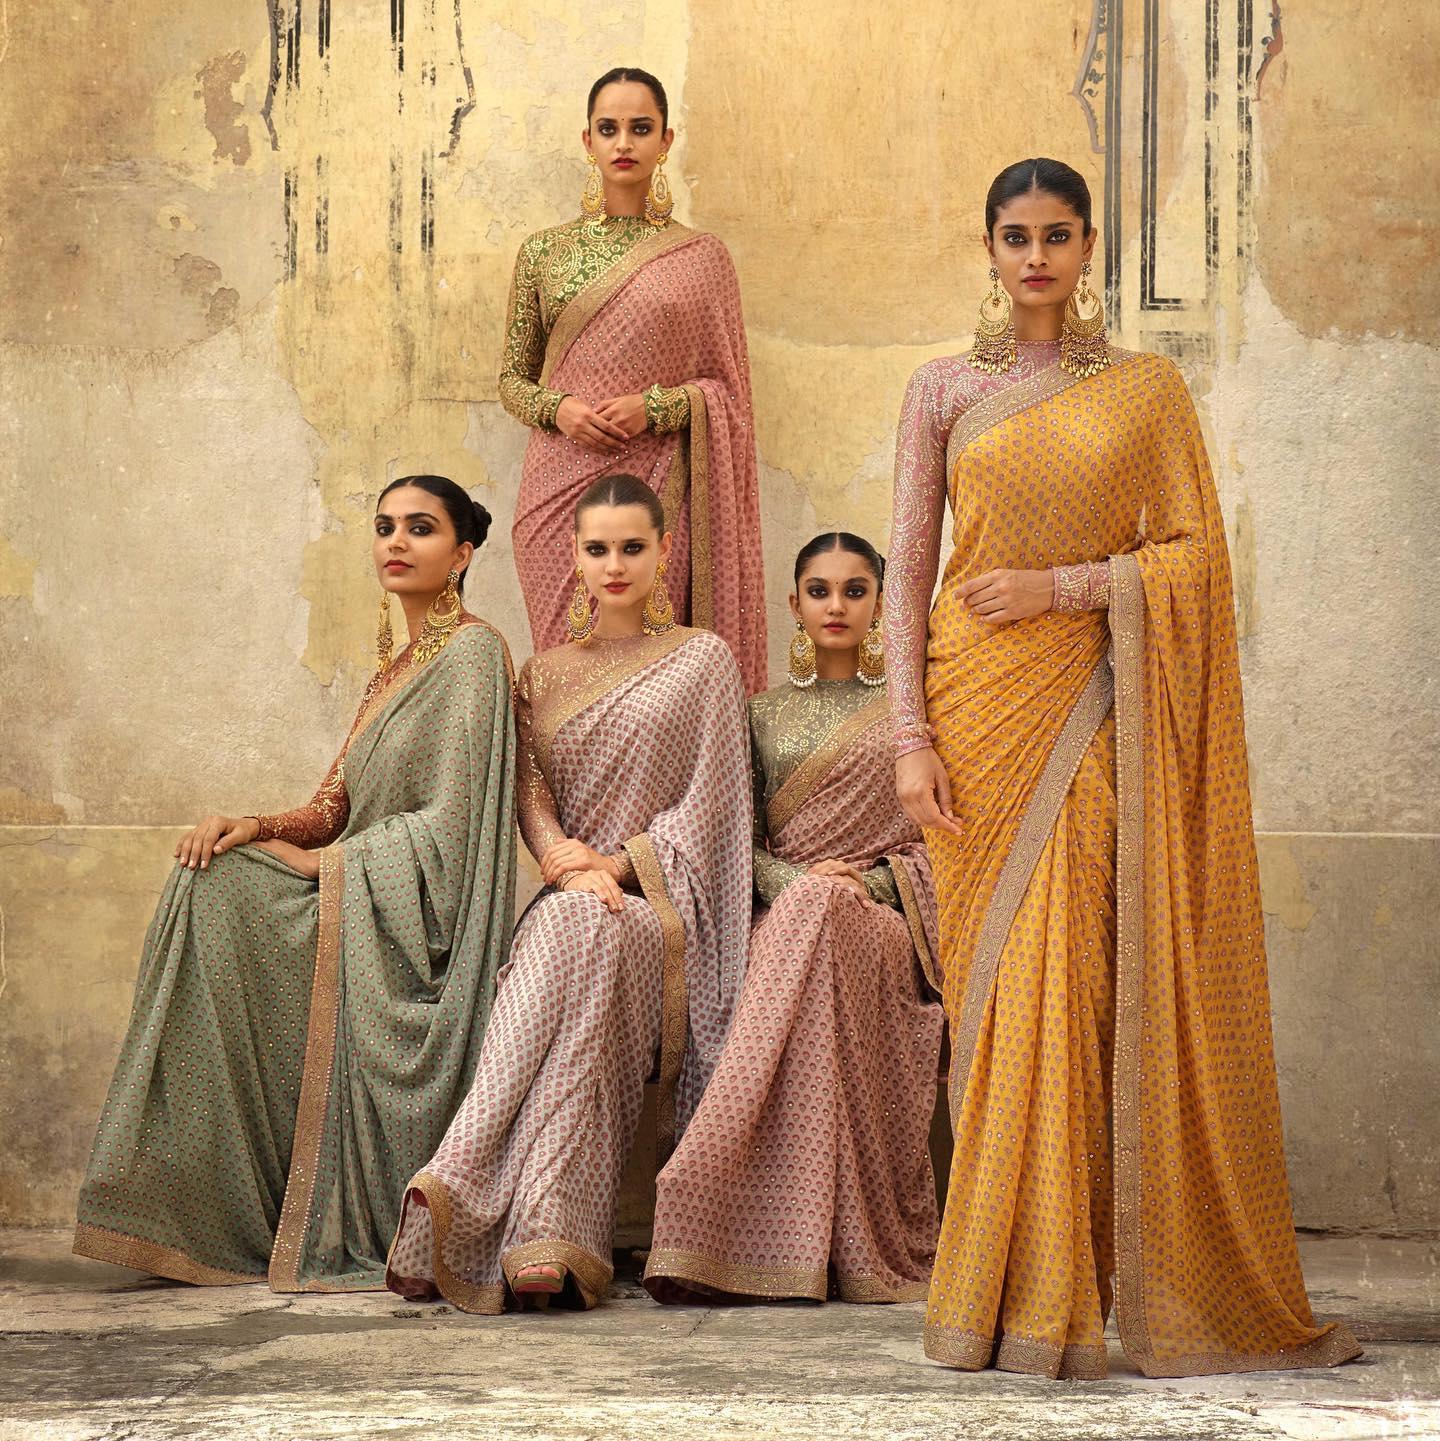 Sabyasachi Mukherjee Summer Collection 2020 for Girls – The Sabya ...